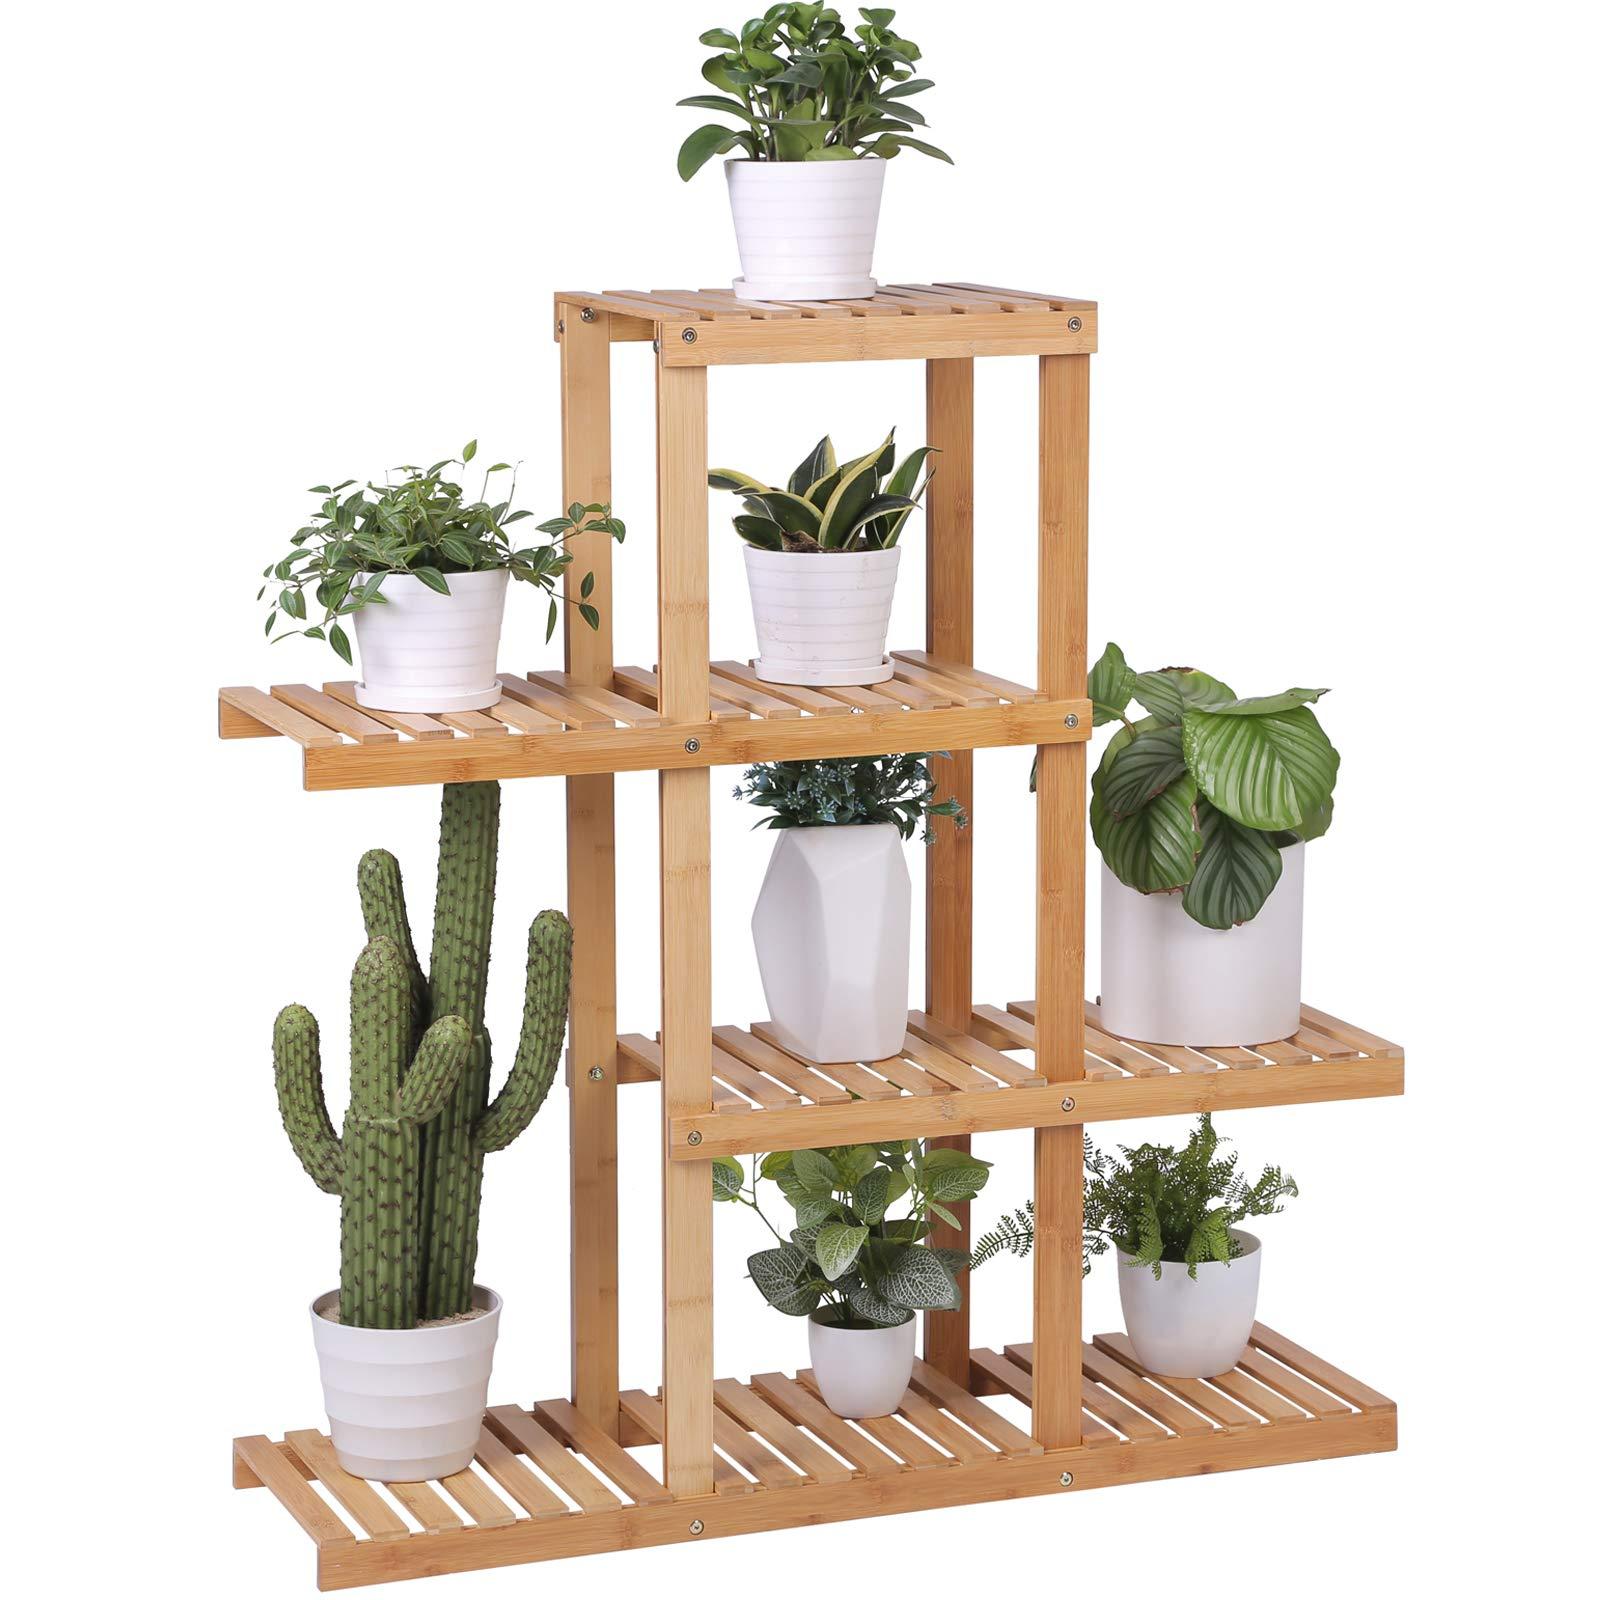 SONGMICS Bamboo Wood Plant Display Rack, Stand Shelf, Flower Pots Holder, 4 Tier Utility Shelving Standing Unit Storage Organizer Rack for Living Room Balcony Hallway Bathroom UBCB91N by SONGMICS (Image #1)